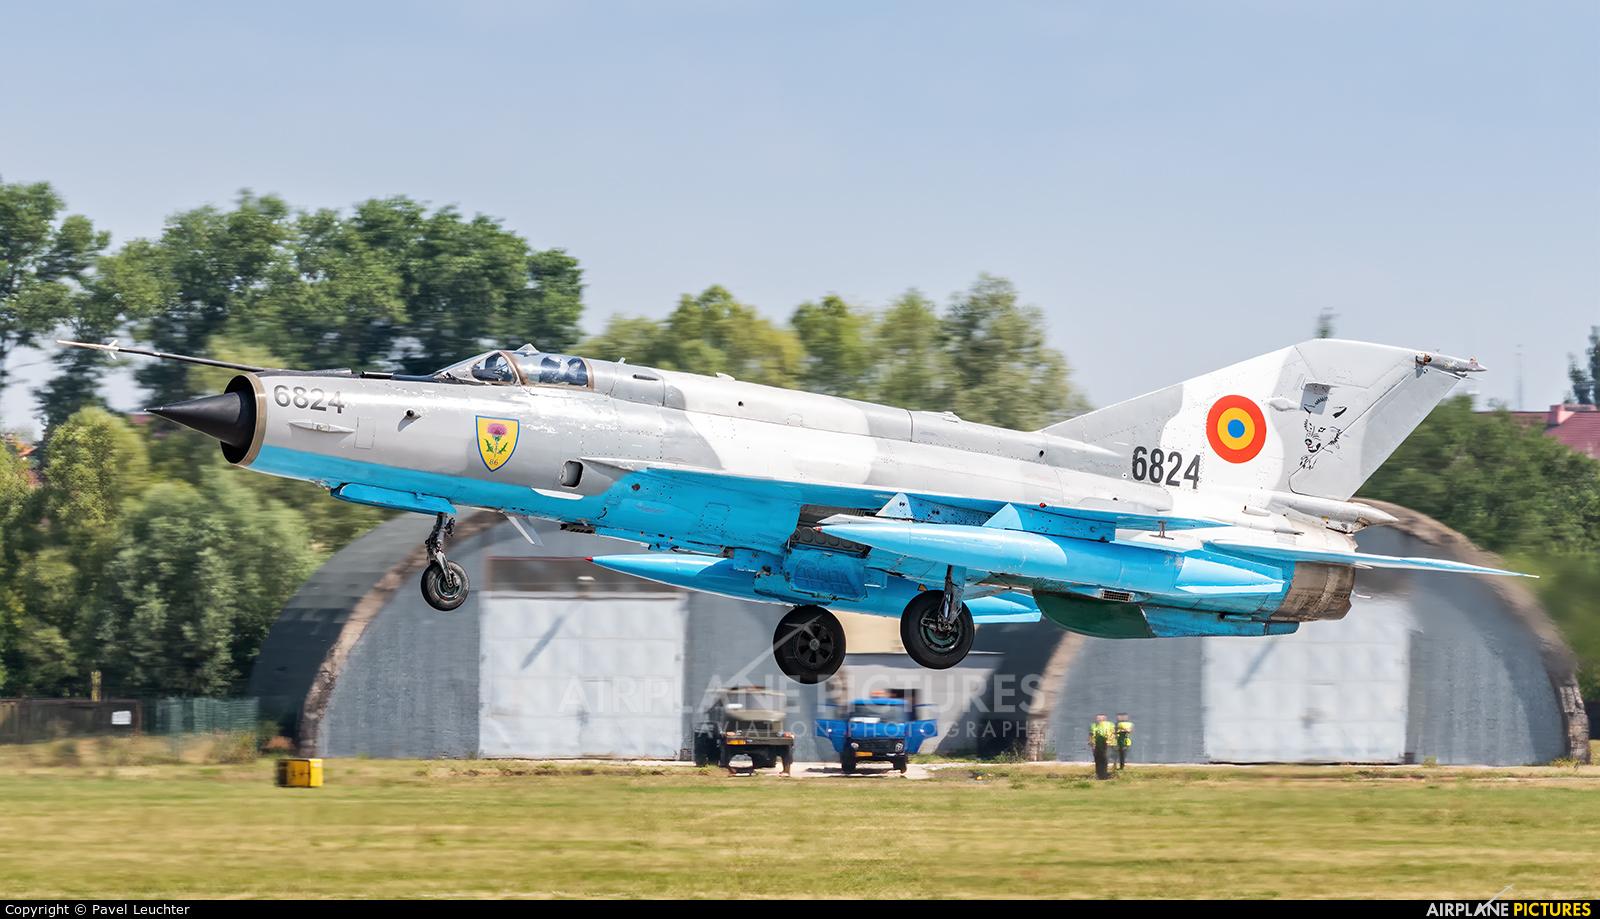 Romania - Air Force 6824 aircraft at Pardubice